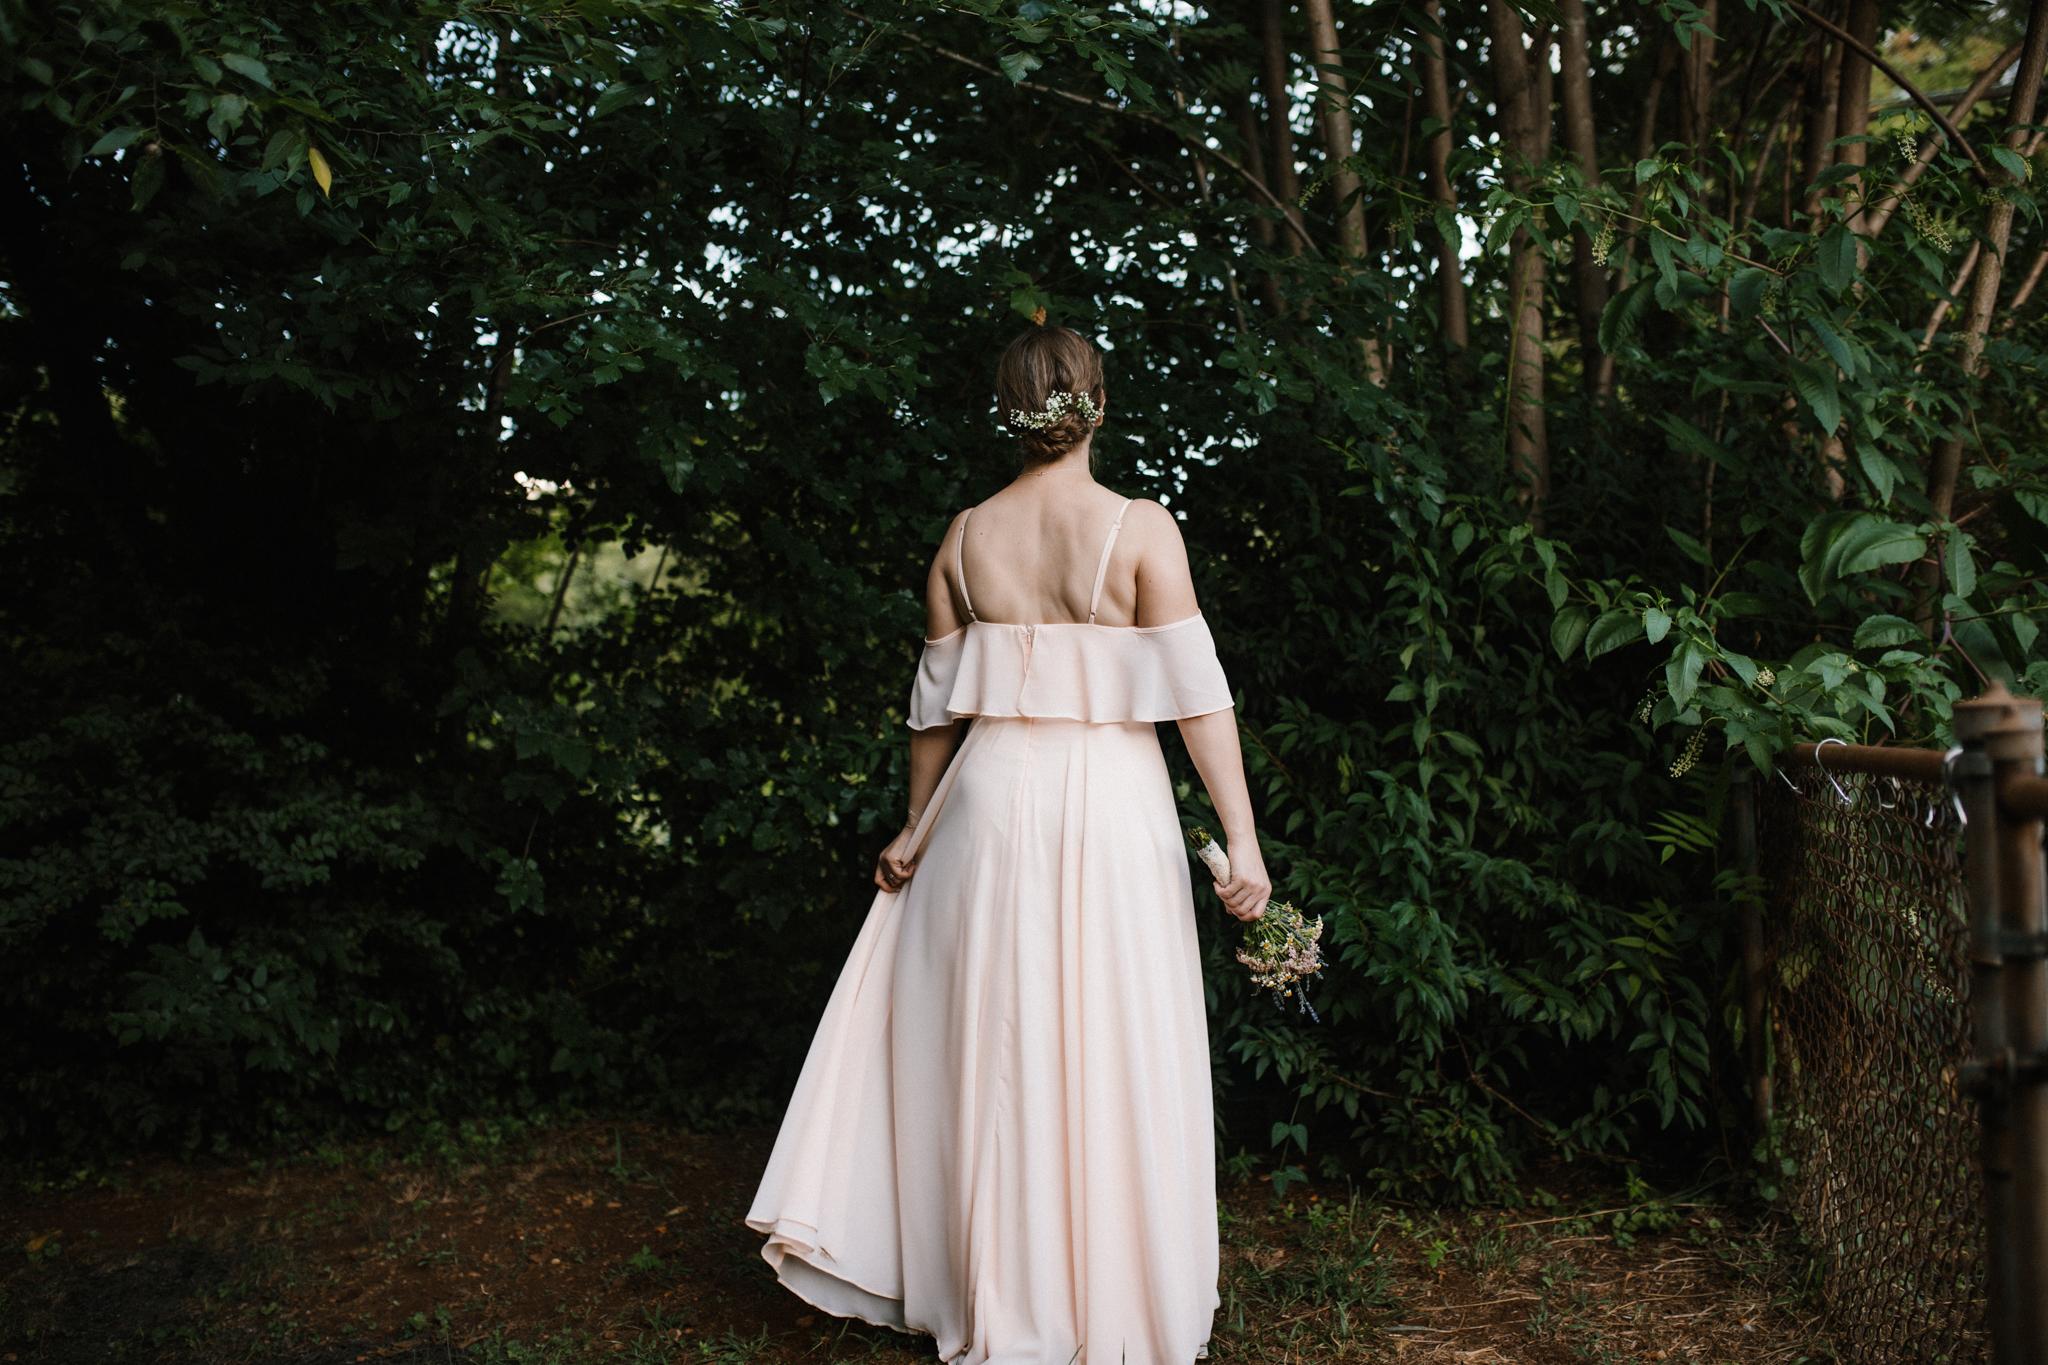 dorota_dwight_richmond_backyard_wedding-59.jpg